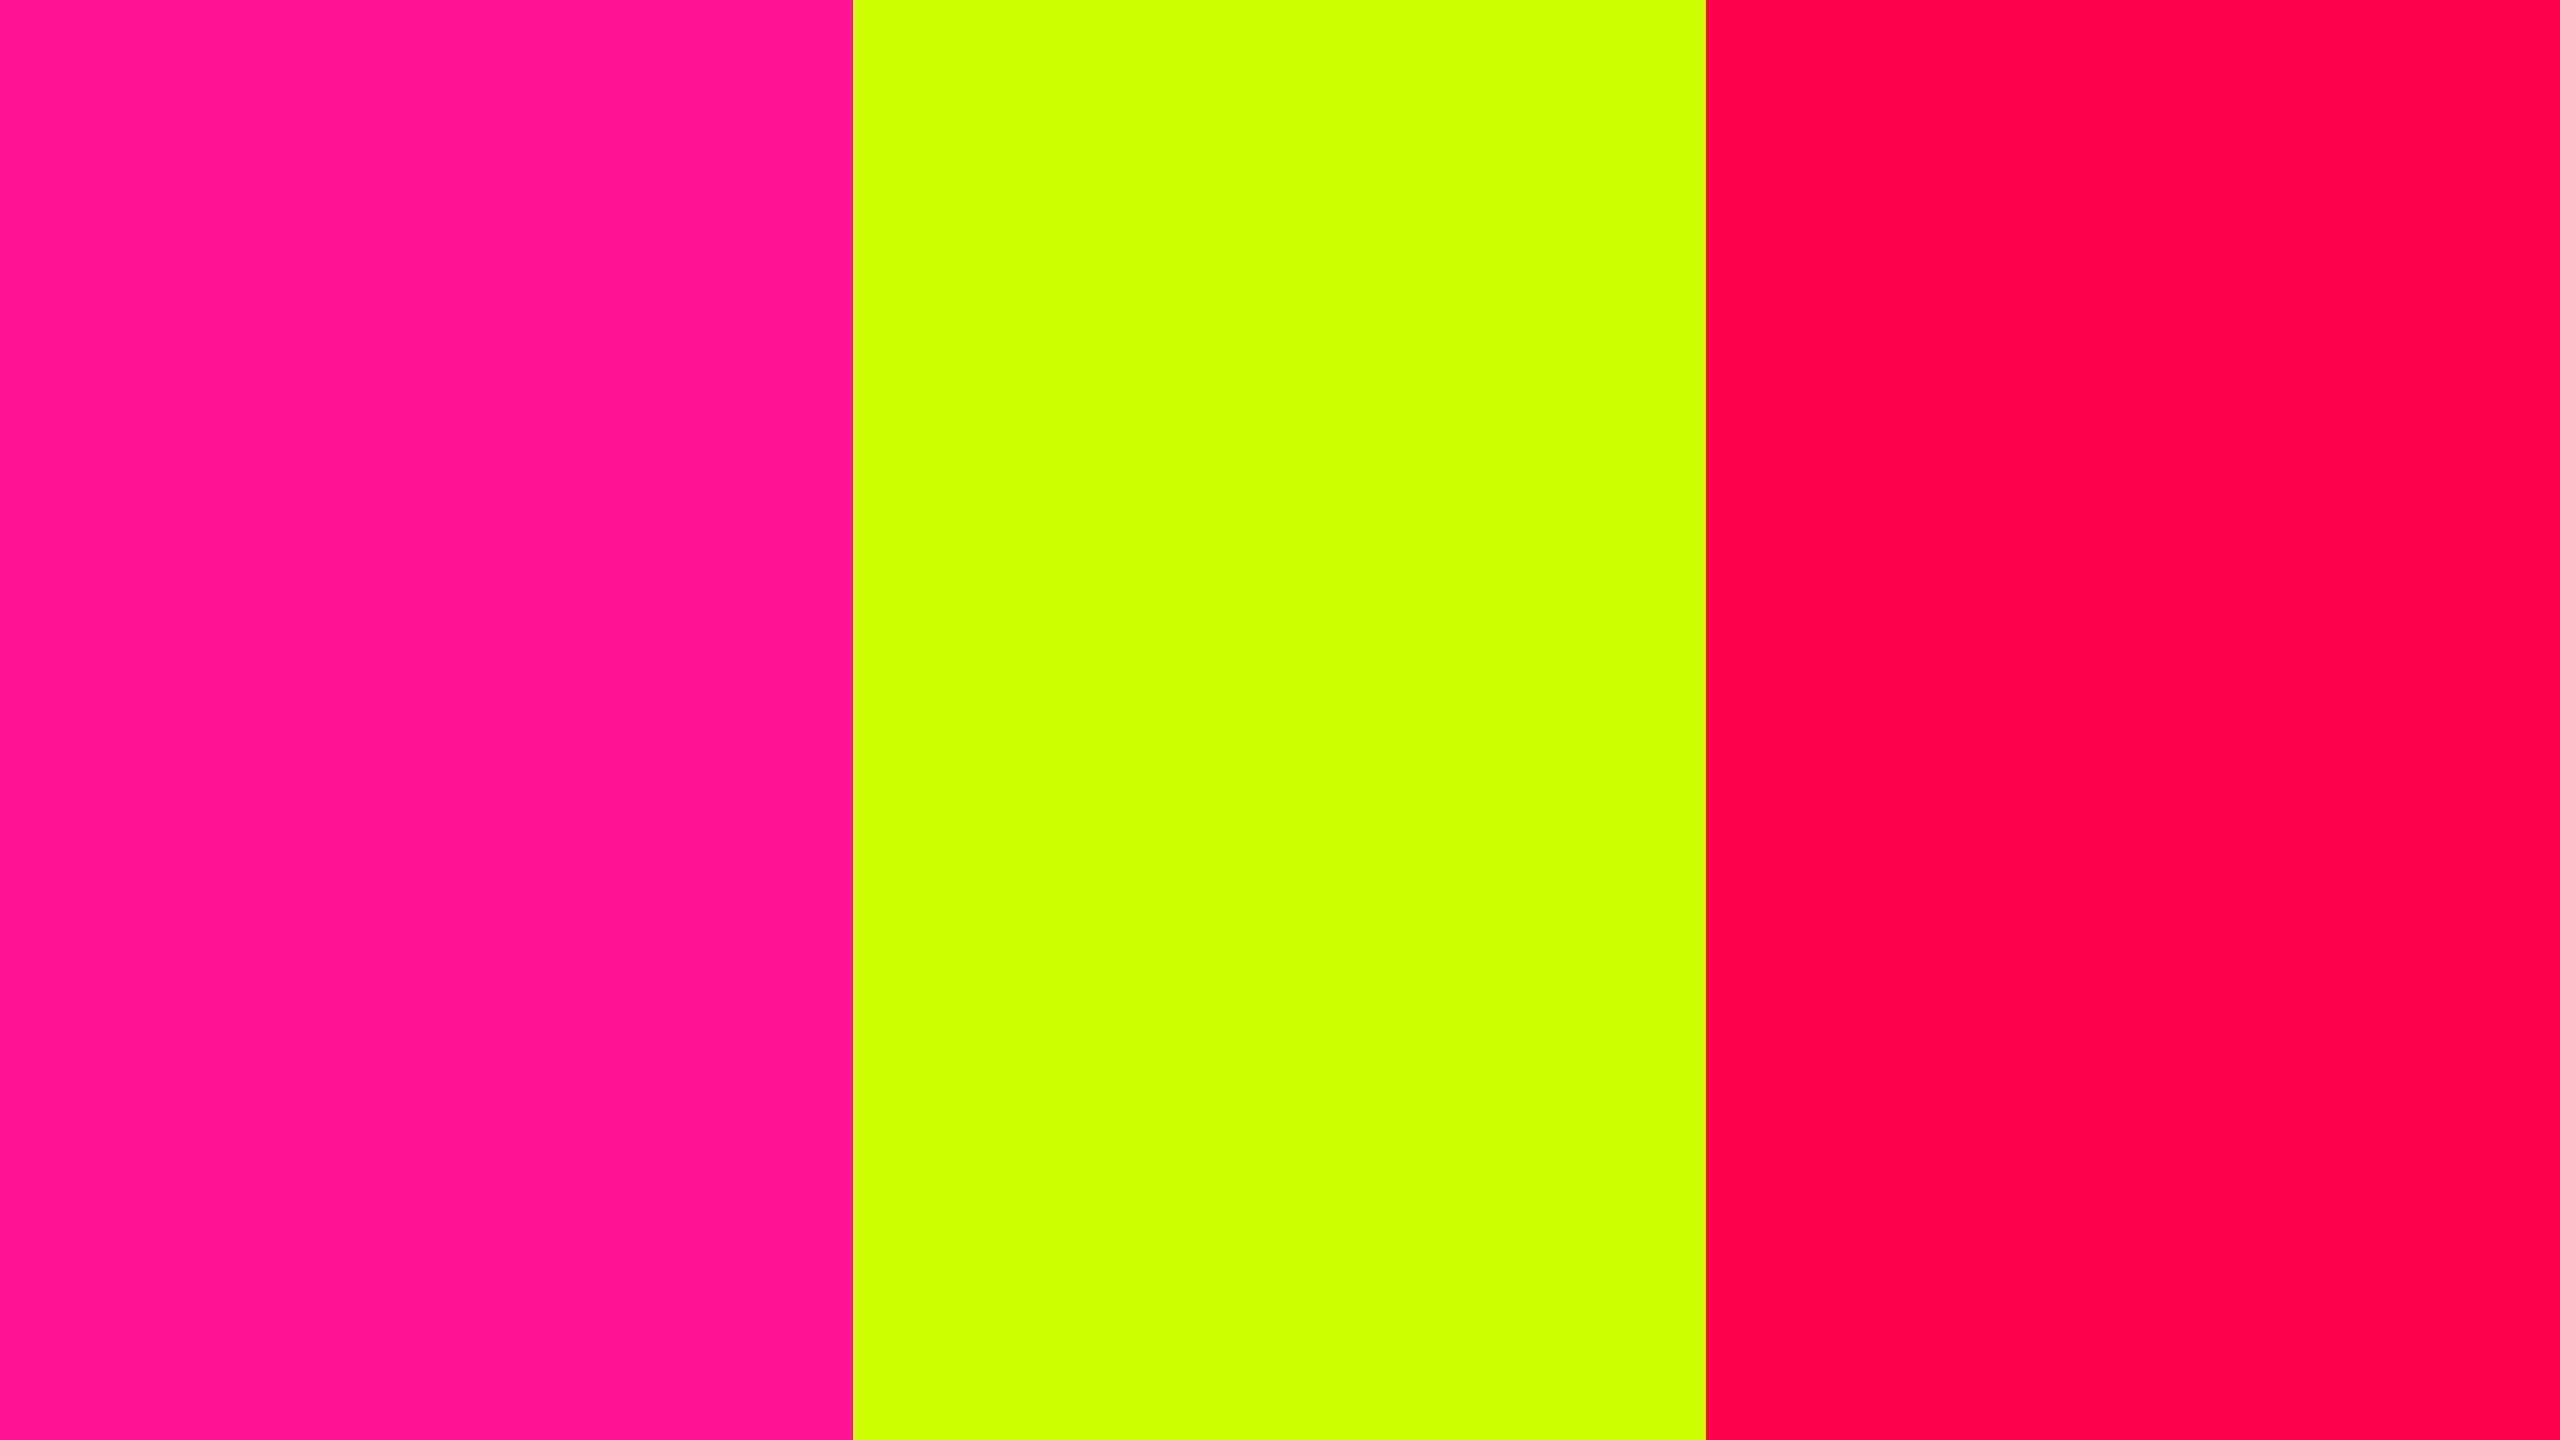 Color Pink Background (56+ images)